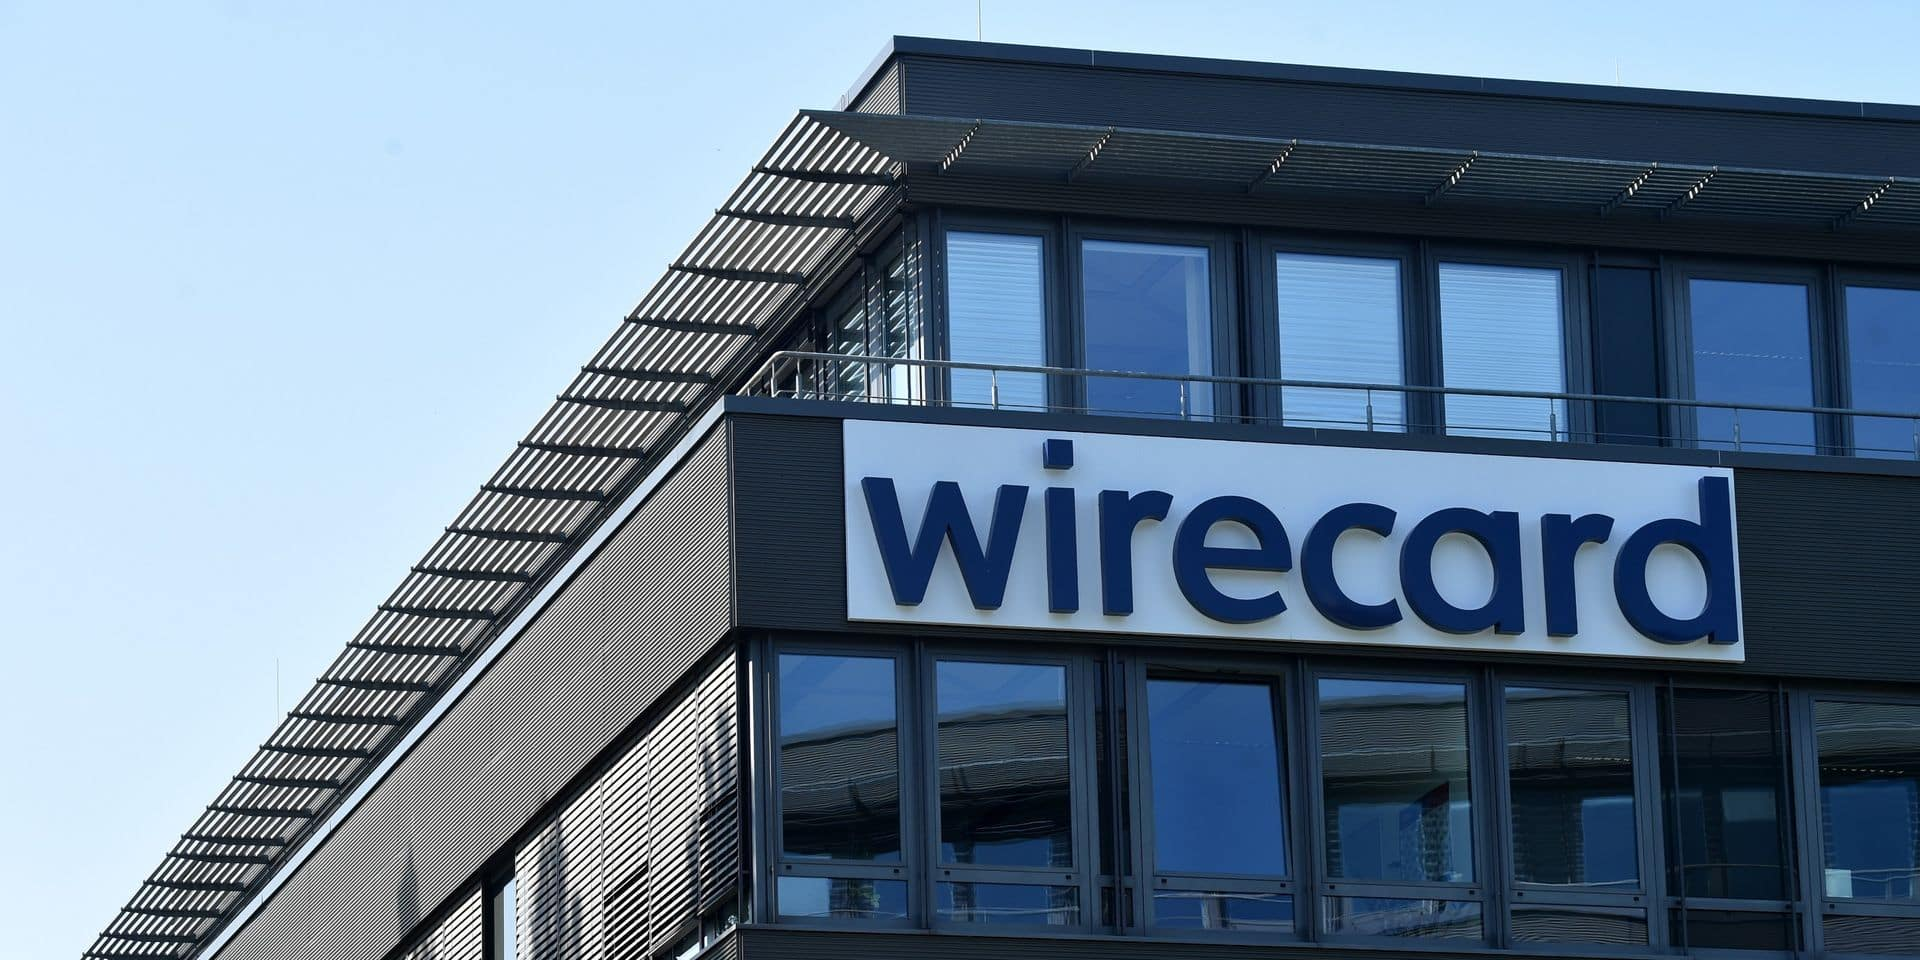 Scandale Wirecard: perquisitions visant d'anciens dirigeants